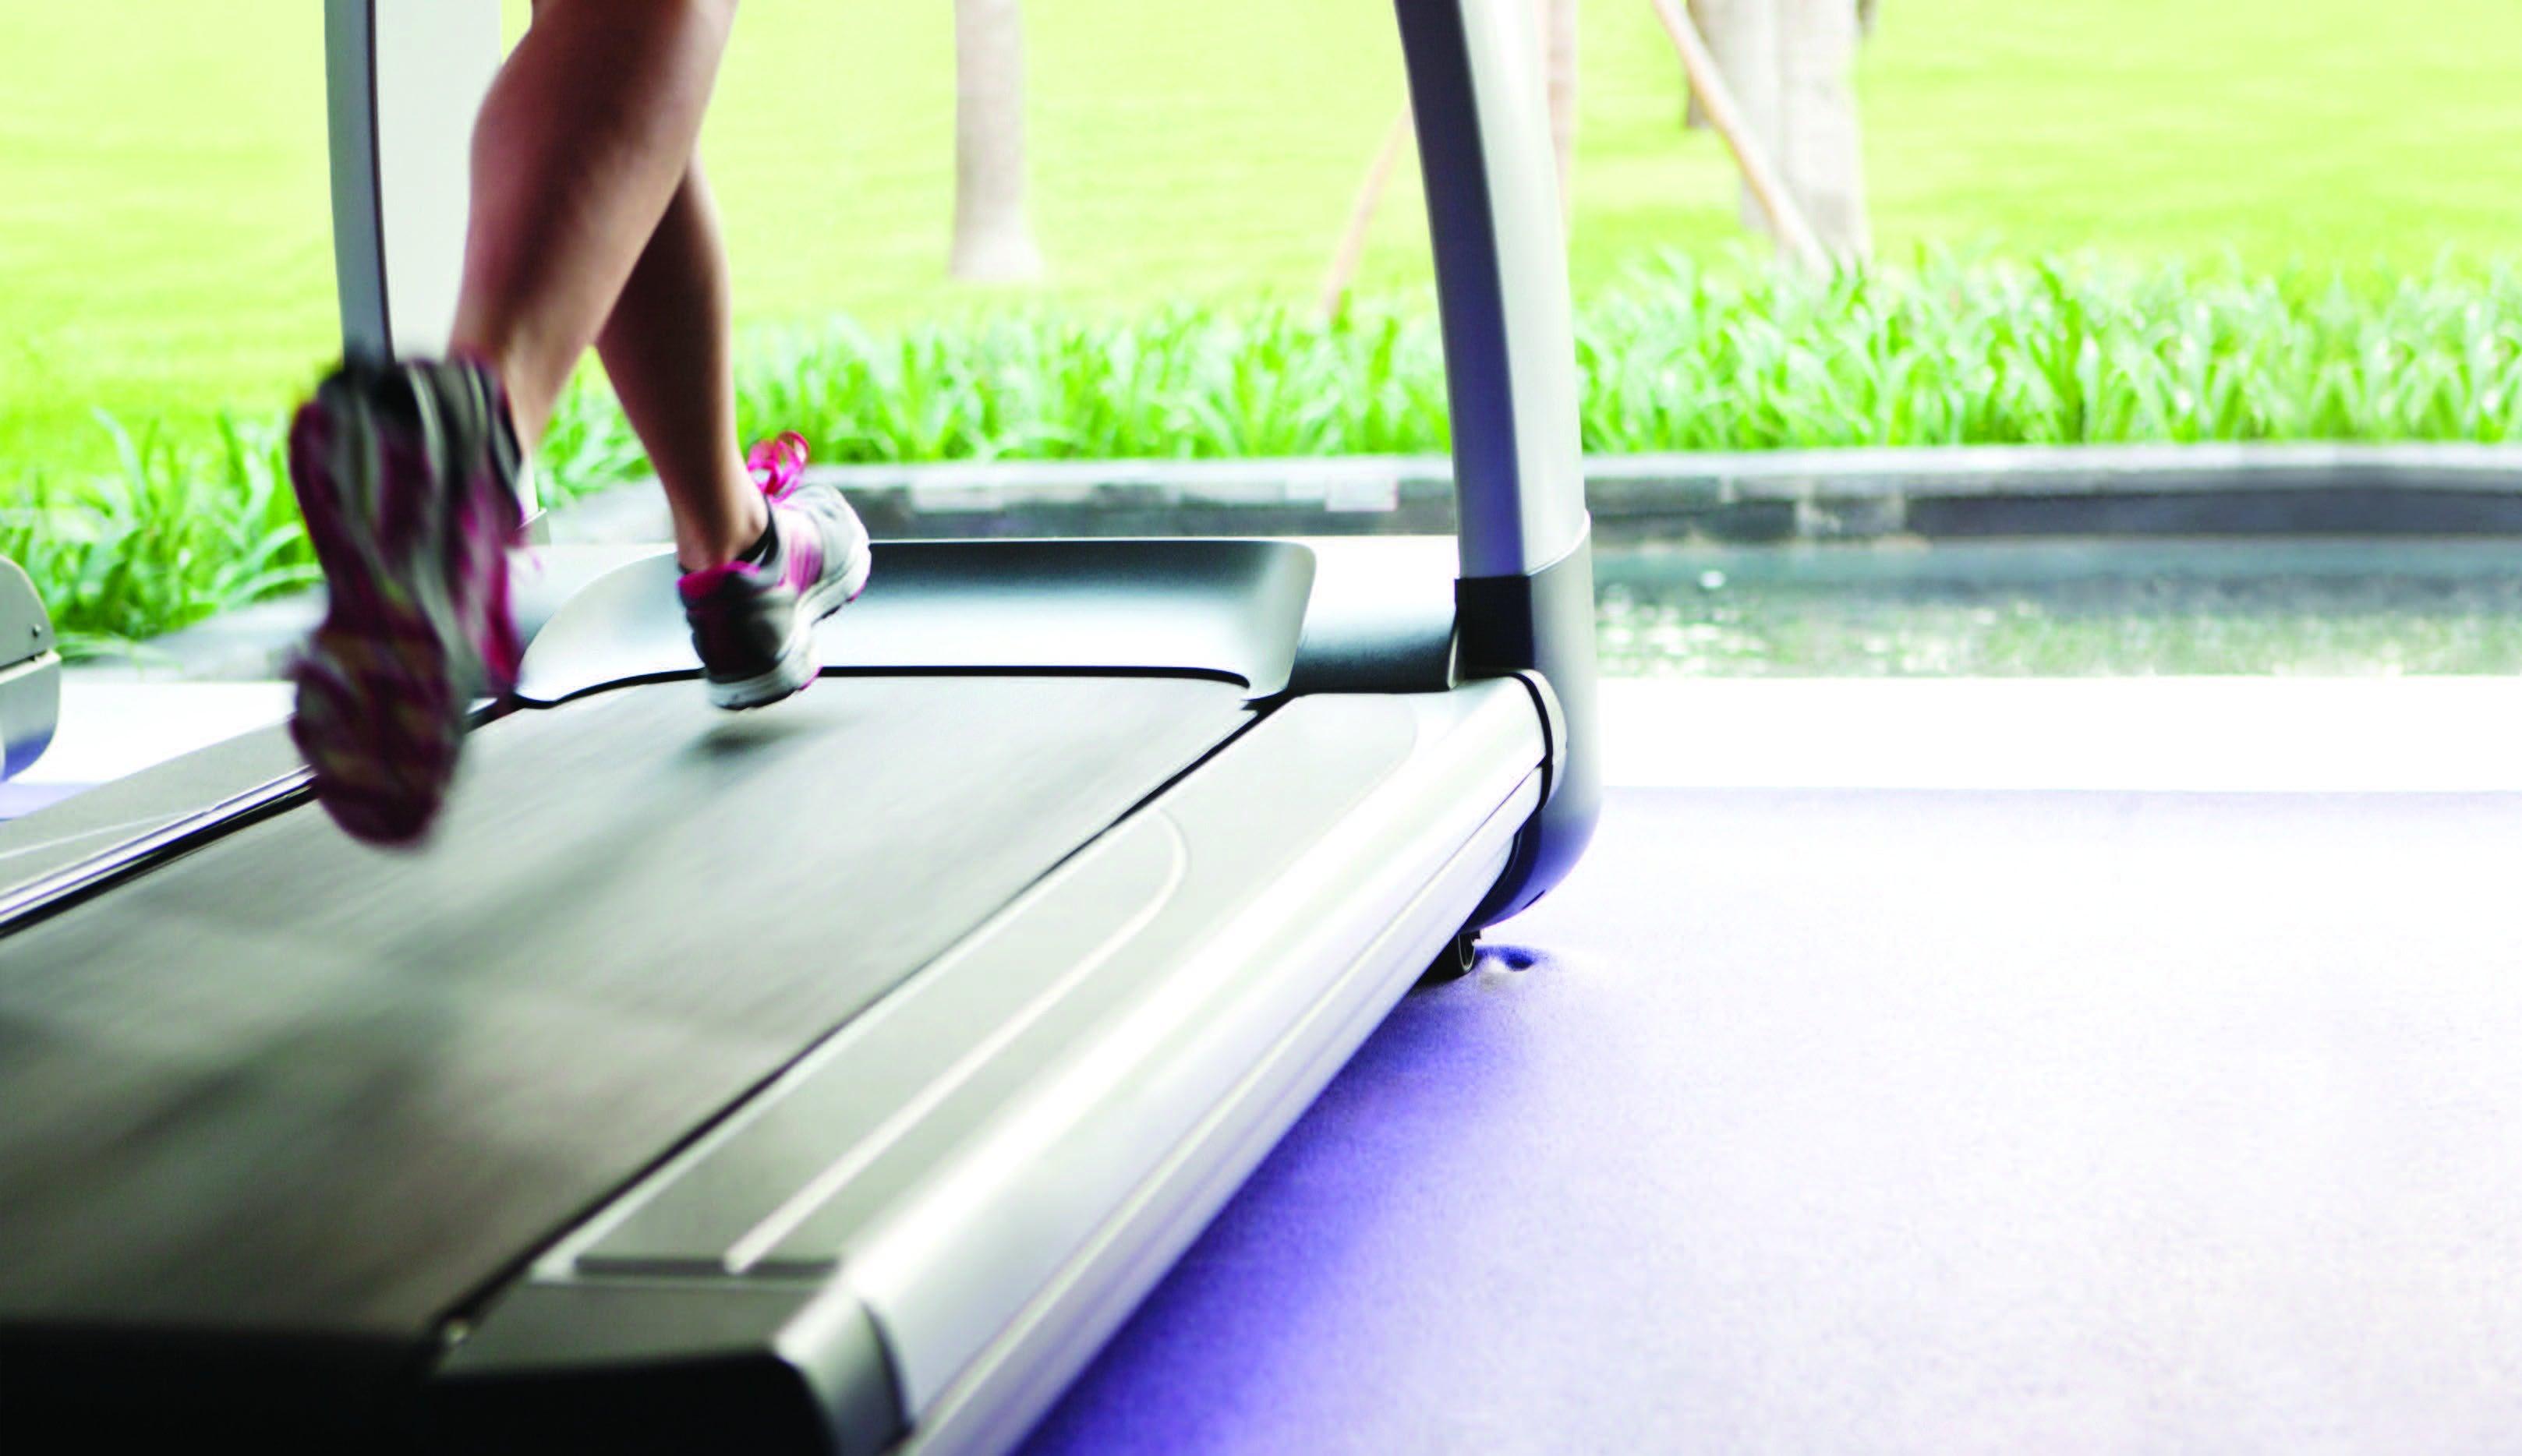 WR treadmill